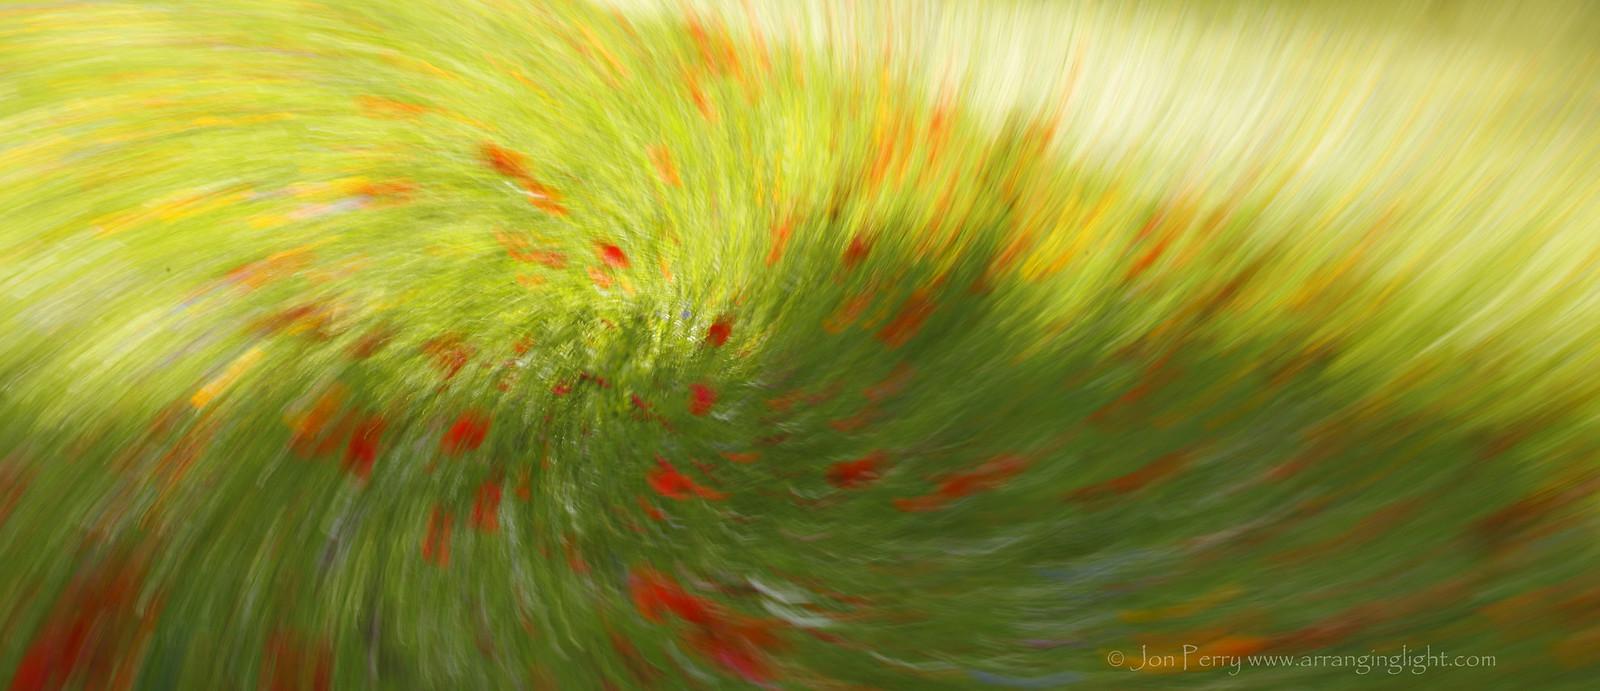 _C0A4372REW Stirring the Meadow, Jon Perry - Enlightenshade, 2-8-15 zan